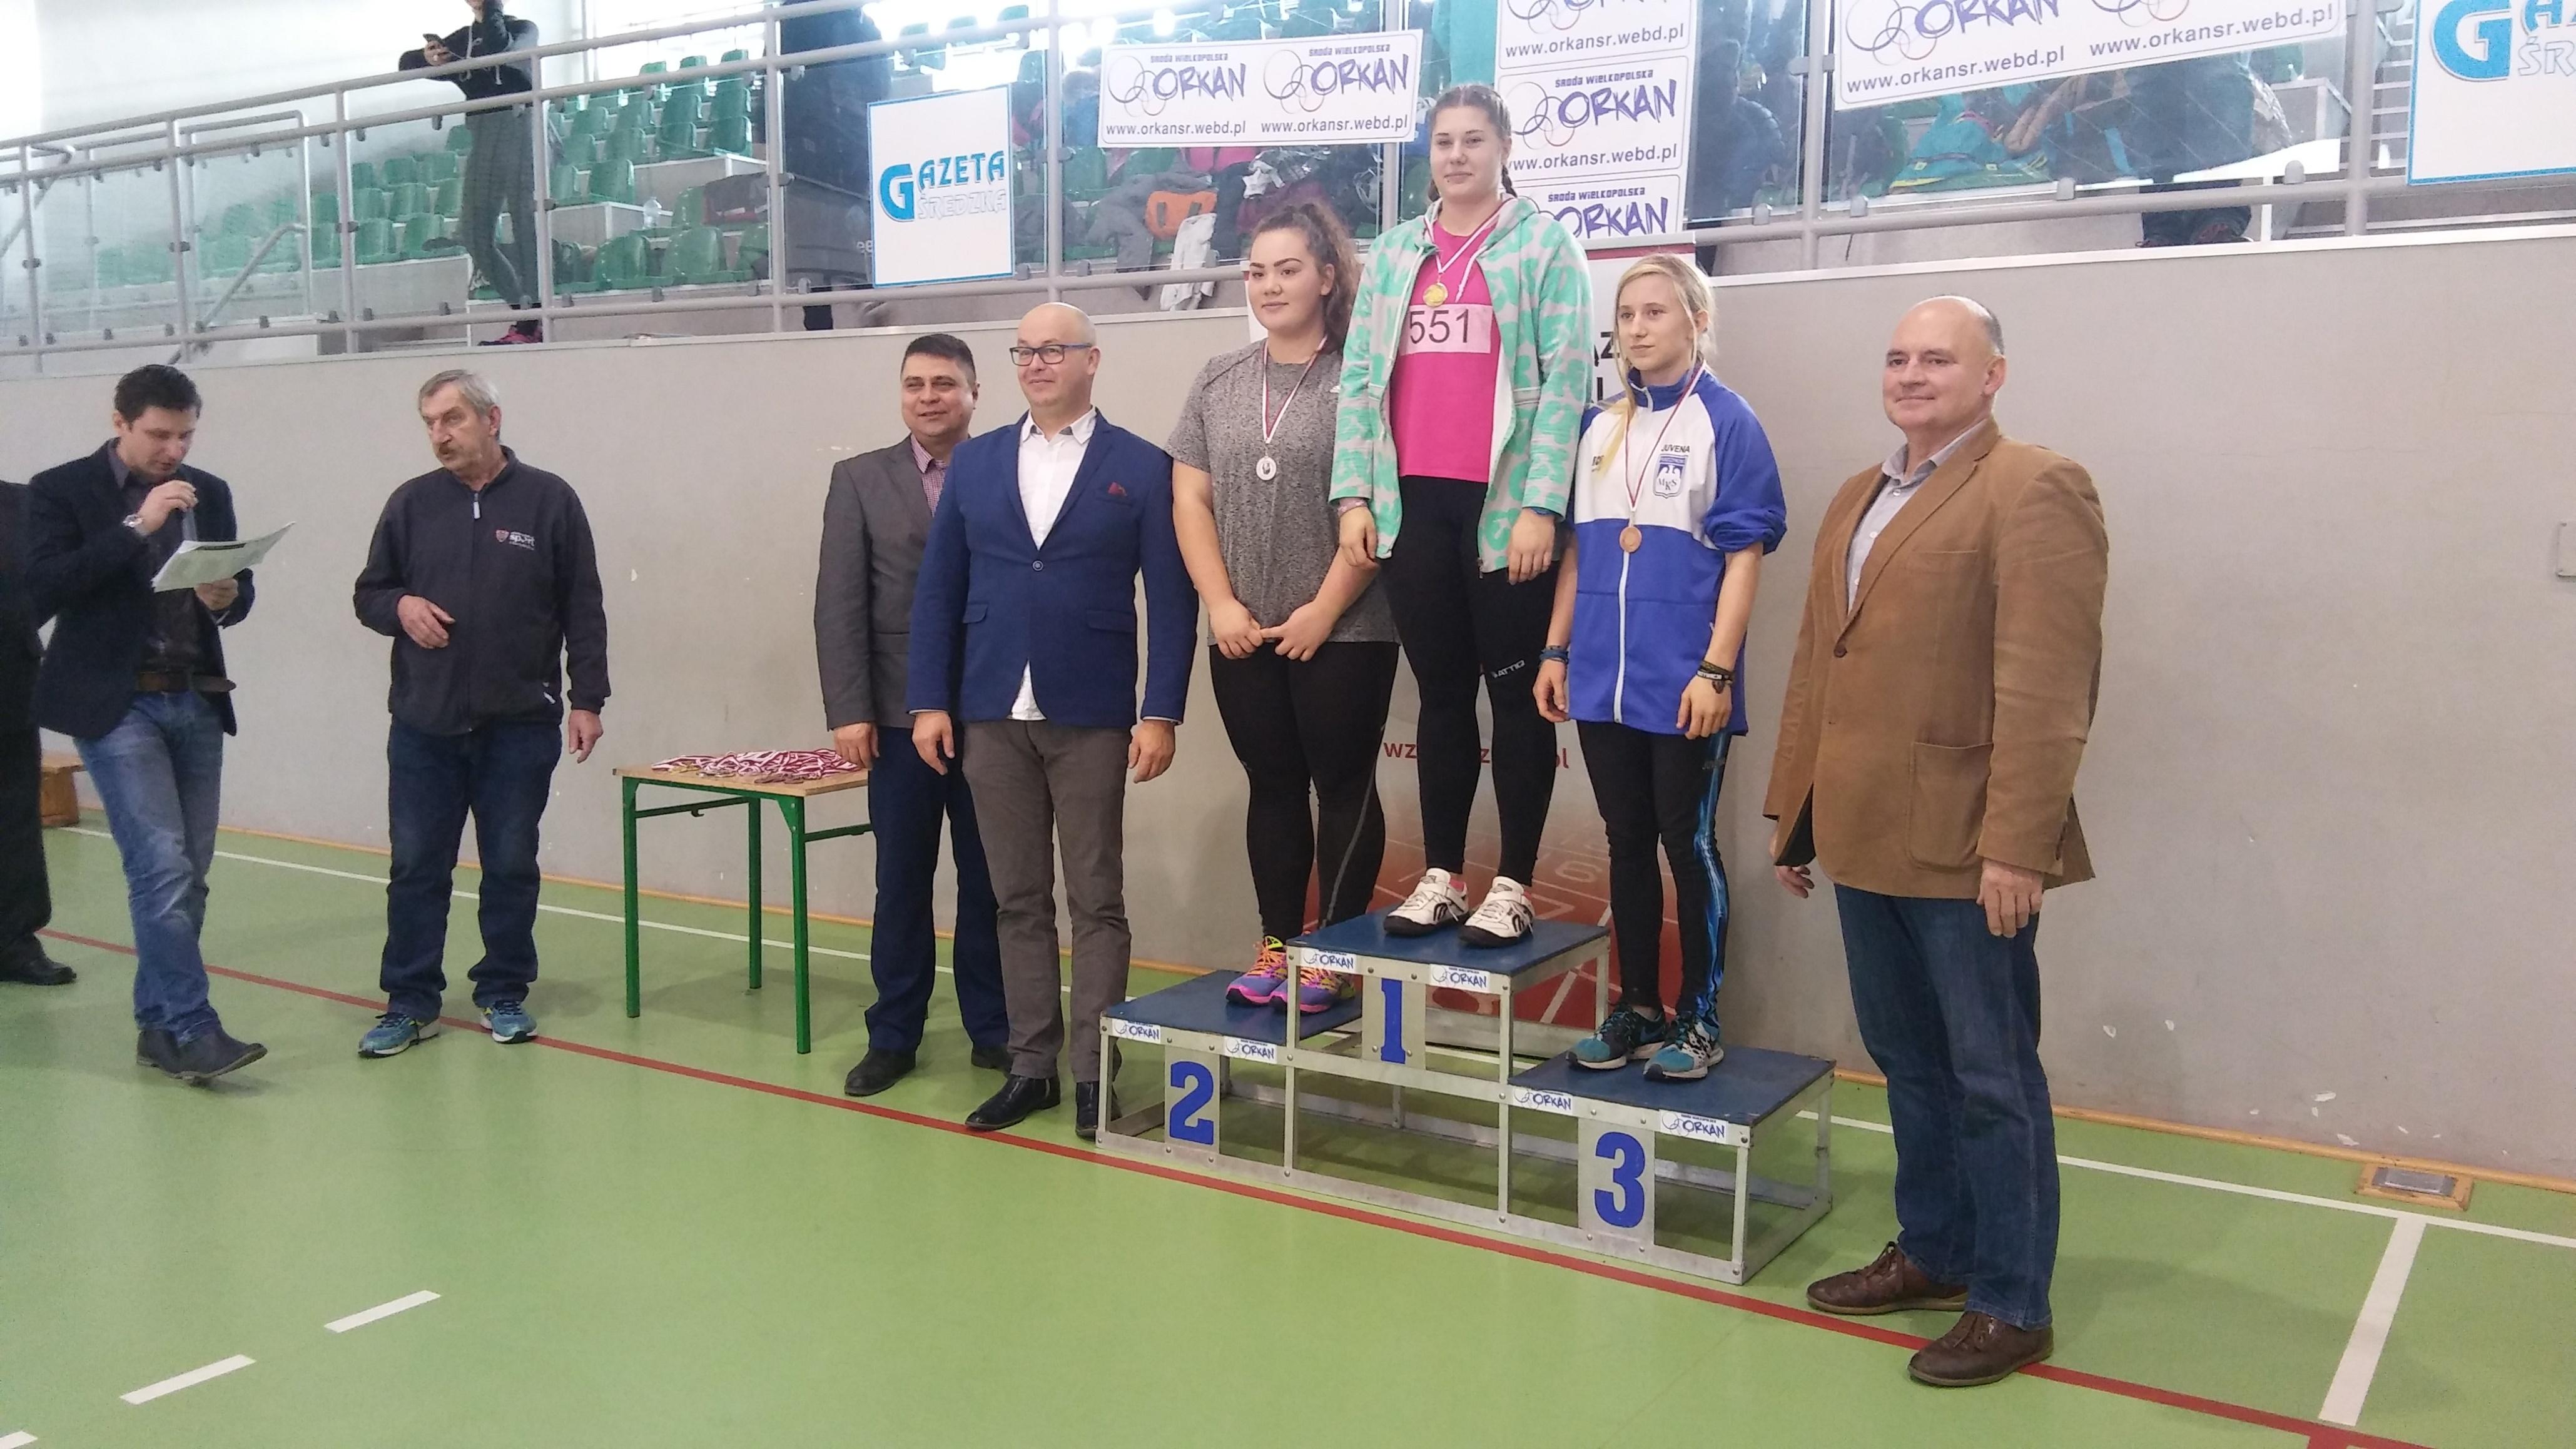 U18: 1m. Klocek Natalia 2m. Marchewka Weronika 3m. Kłosińska Lena